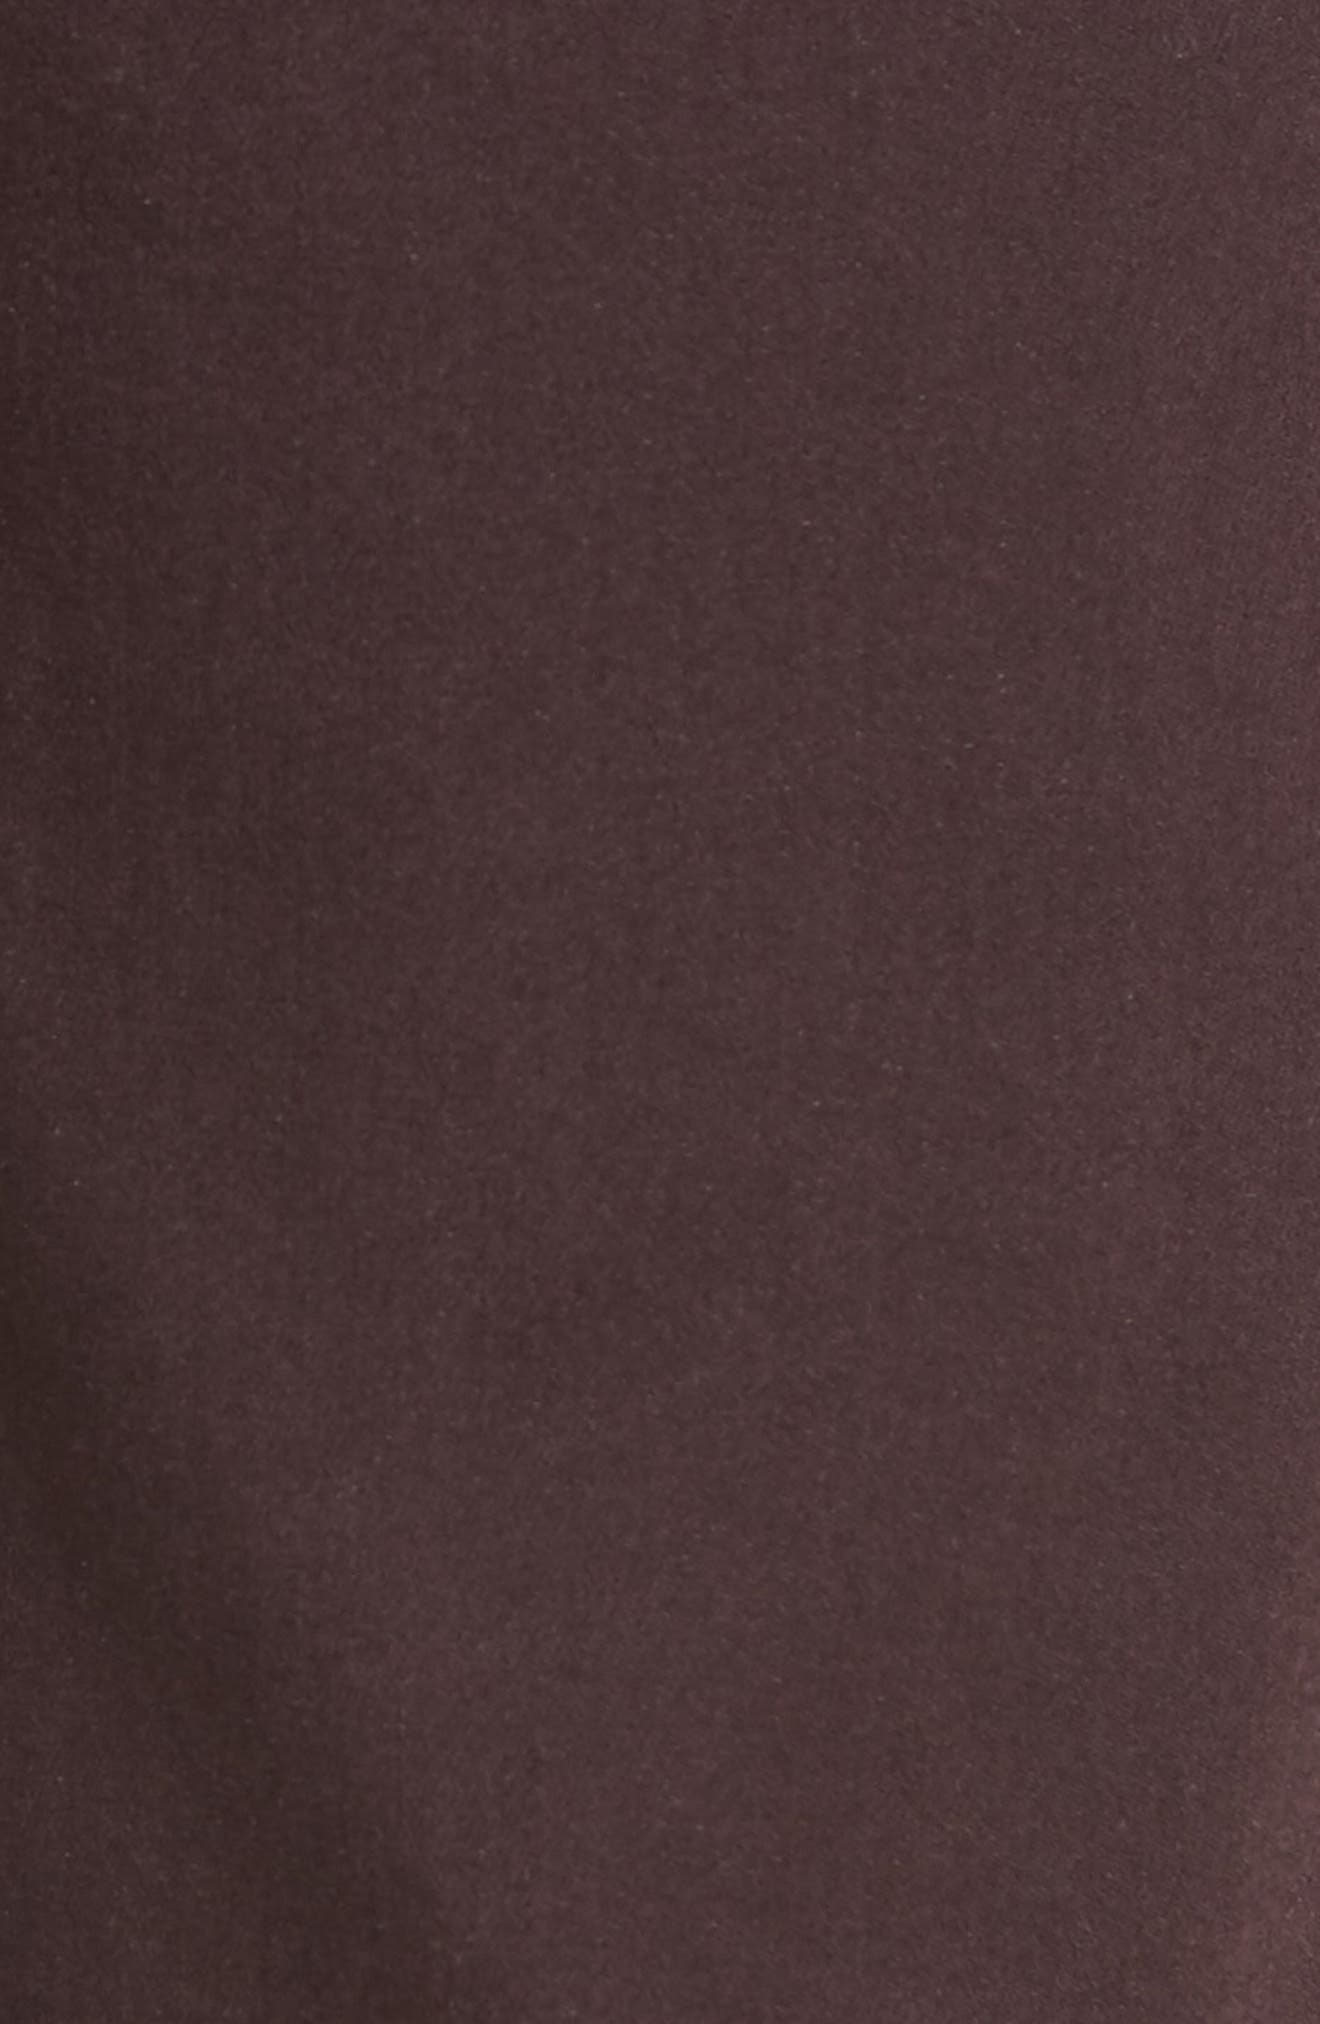 Transcend - Federal Slim Straight Fit Jeans,                             Alternate thumbnail 5, color,                             DARK PORT